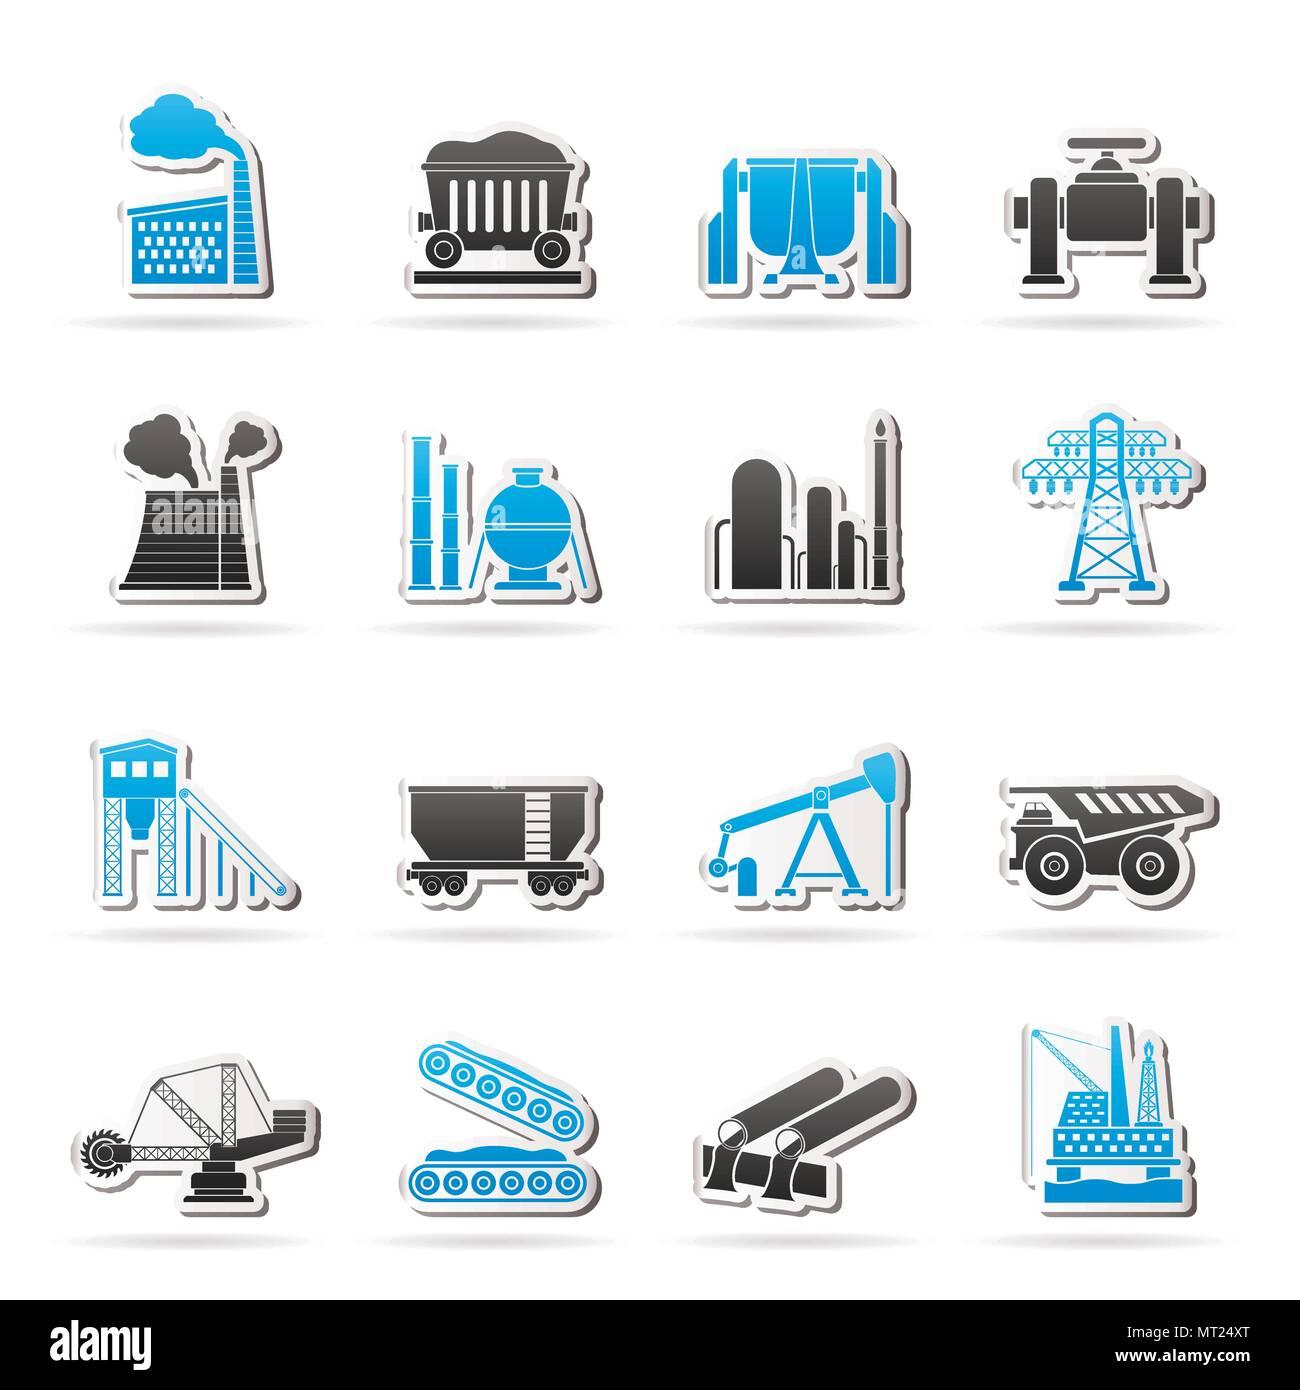 Heavy industry icons - vector icon set - Stock Vector